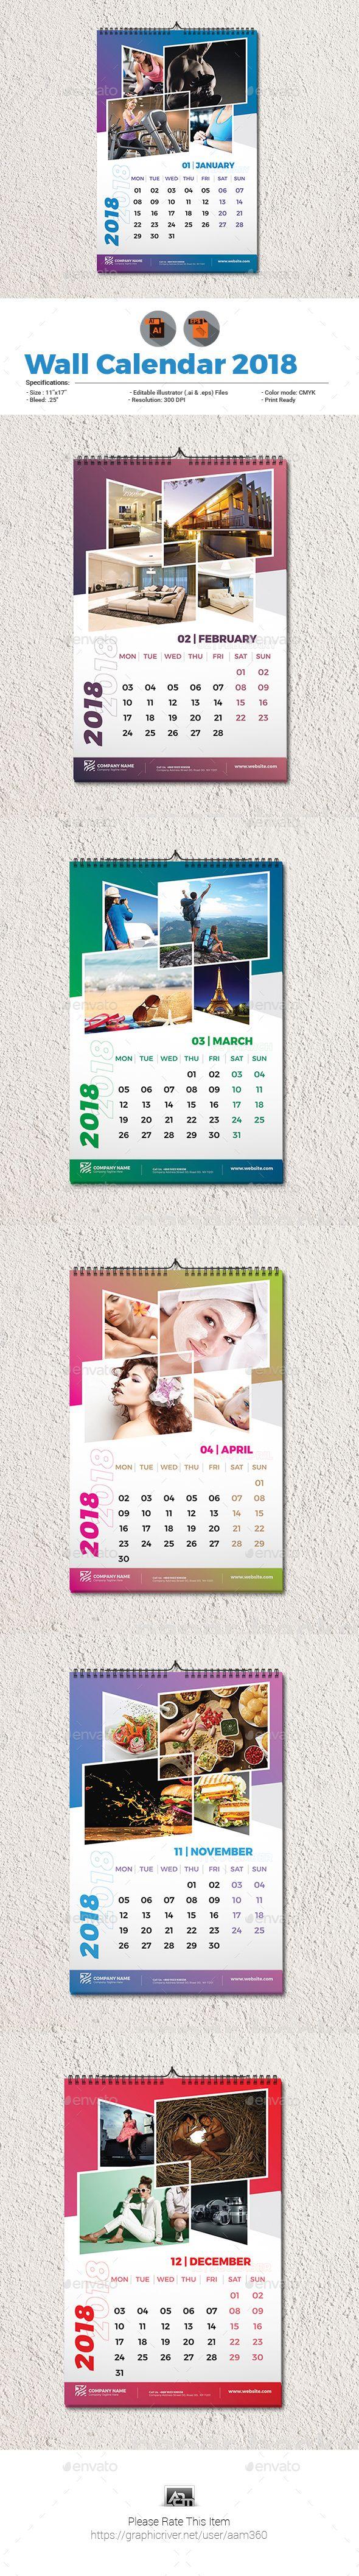 Wall calendar 2018 template calendar 2018 template and ai illustrator wall calendar 2018 template calendars stationery saigontimesfo